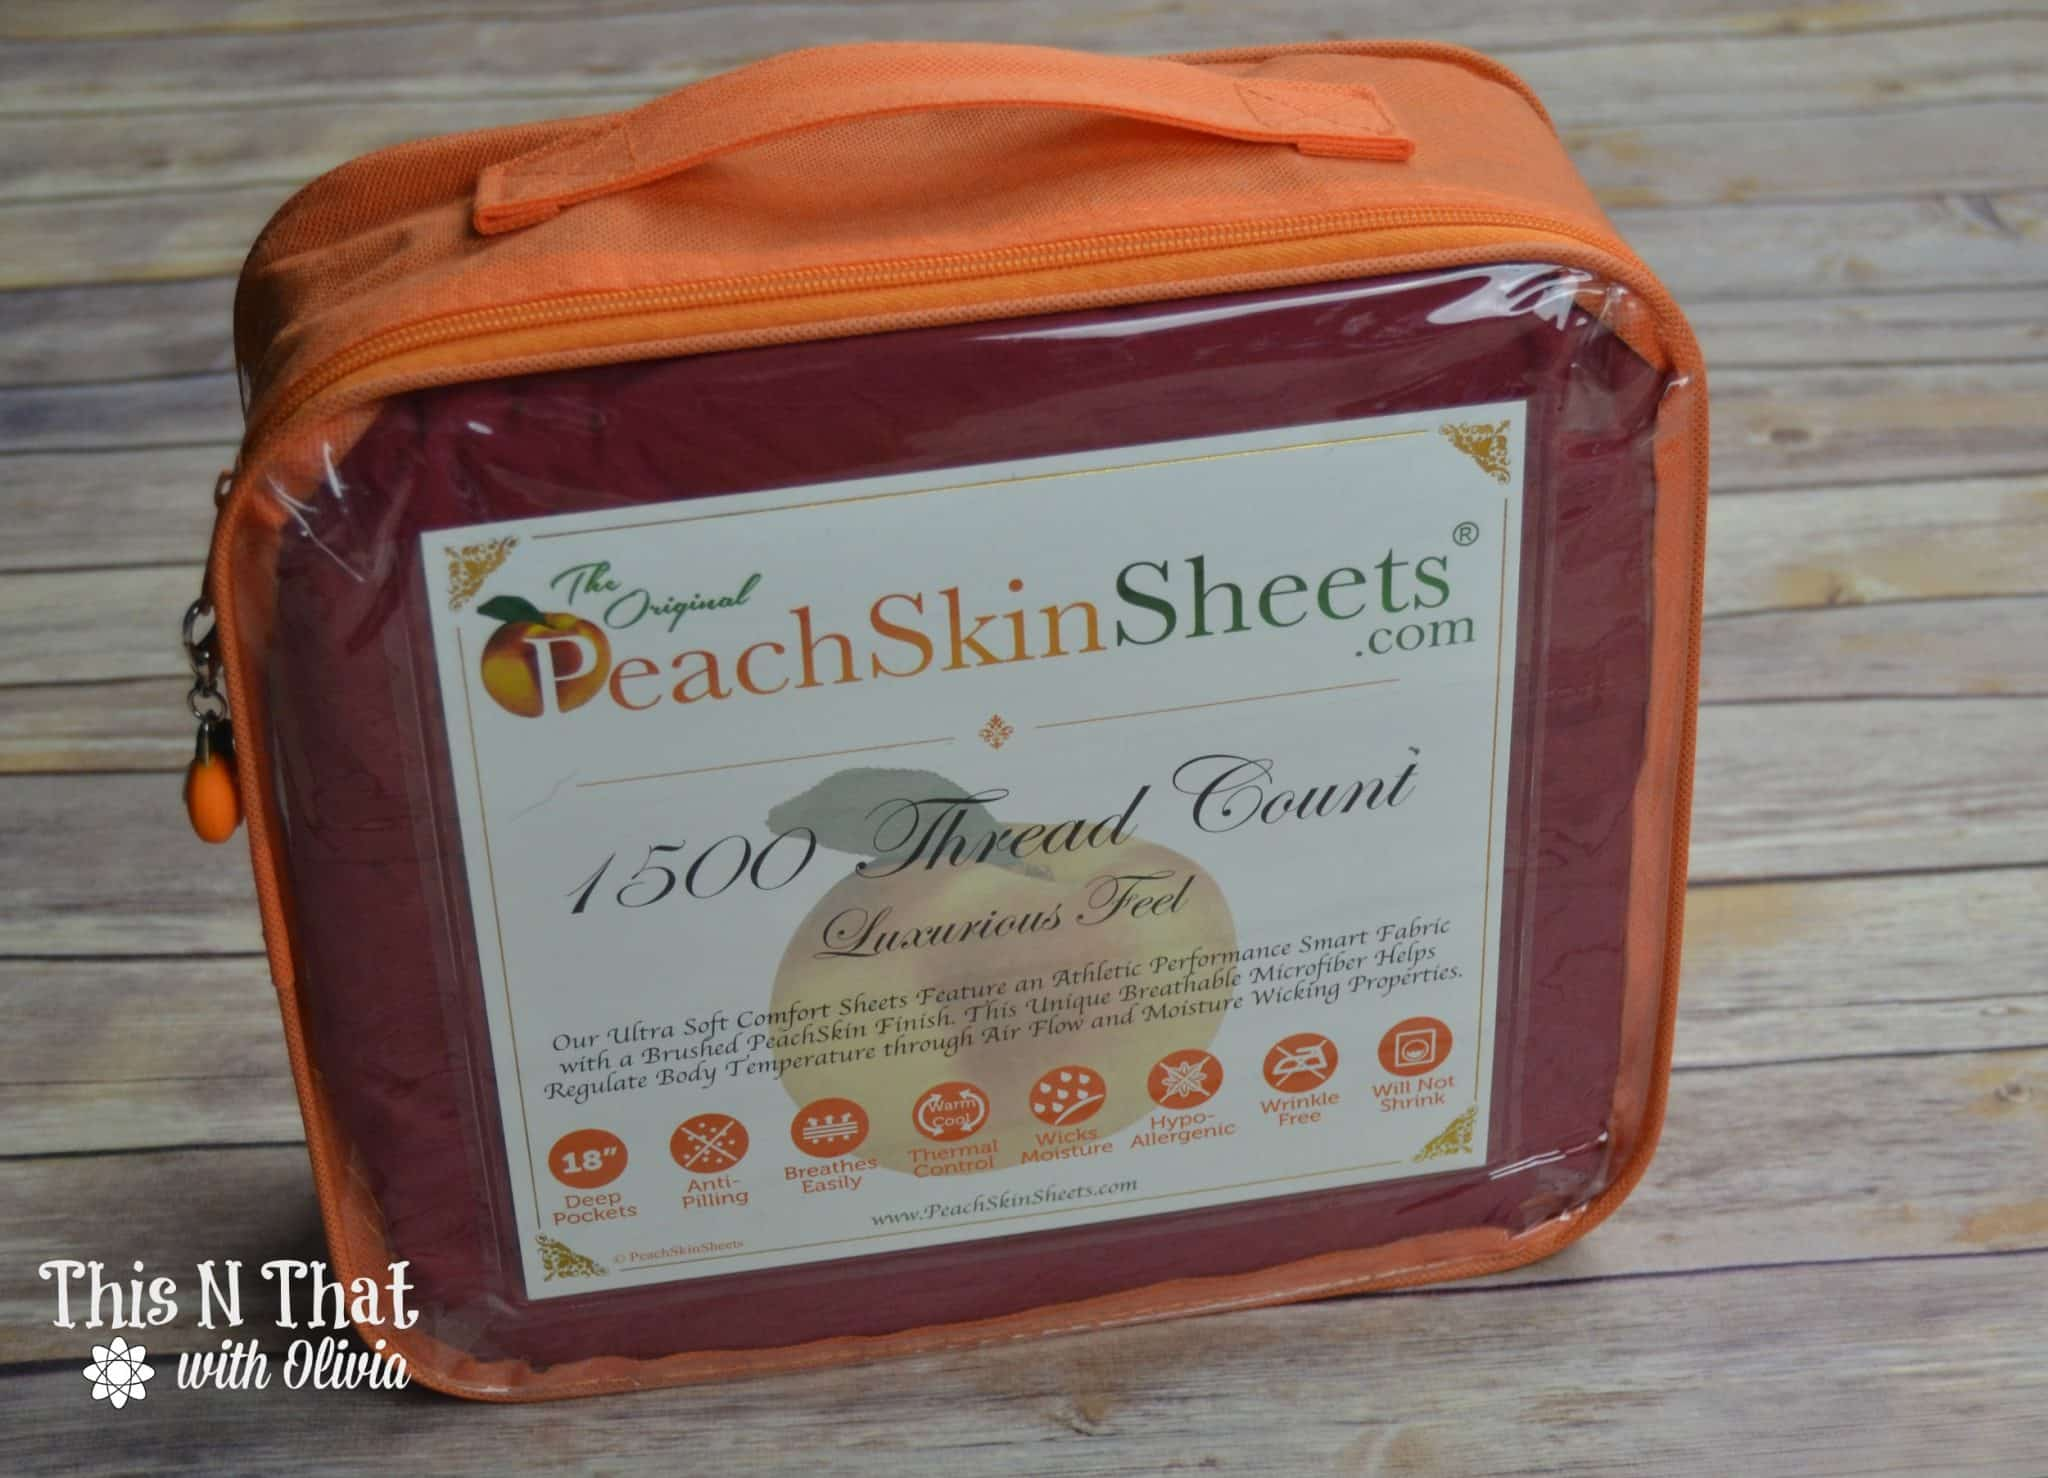 PeachSkinSheets Review + Giveaway! @PeachSkinSheets